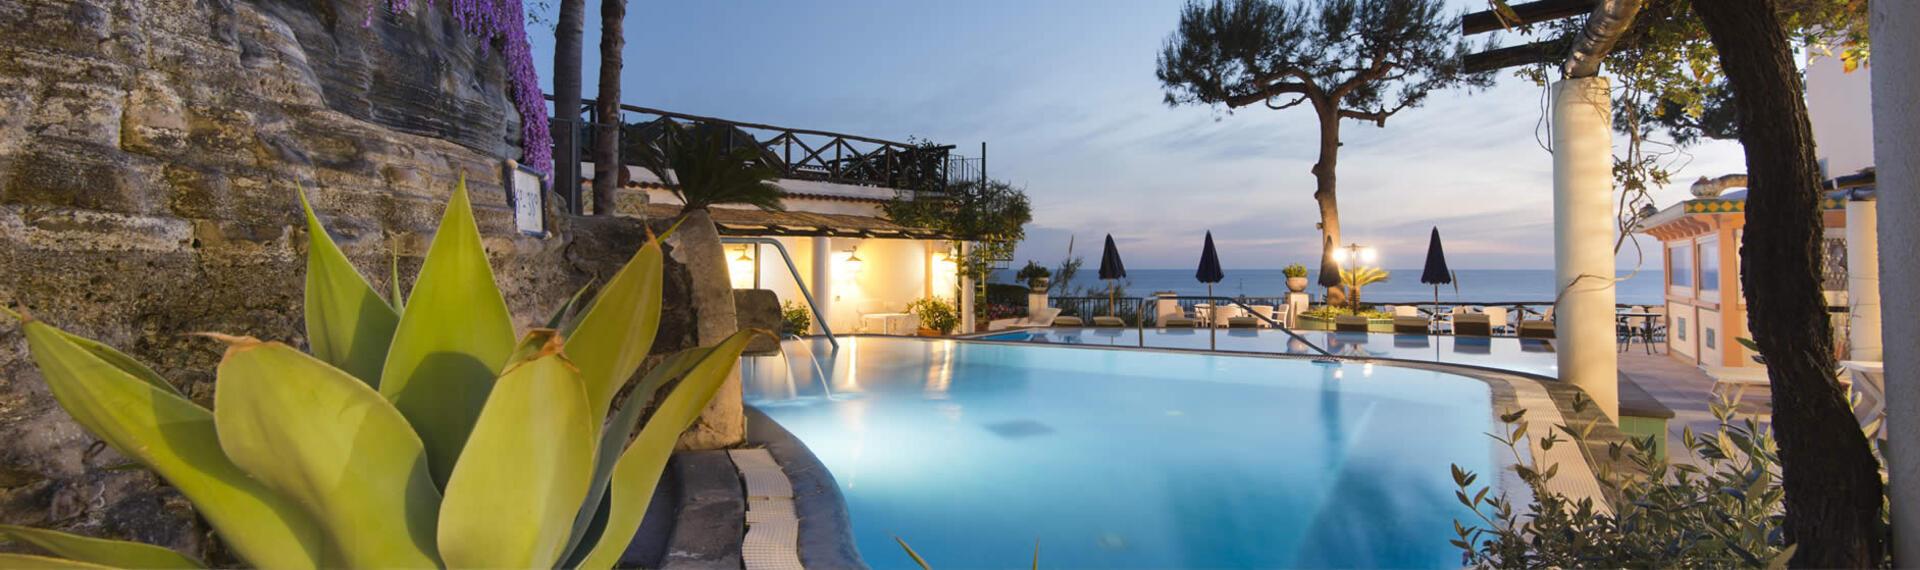 hotelvillabianca it offerta-giugno-forio-d-ischia 009